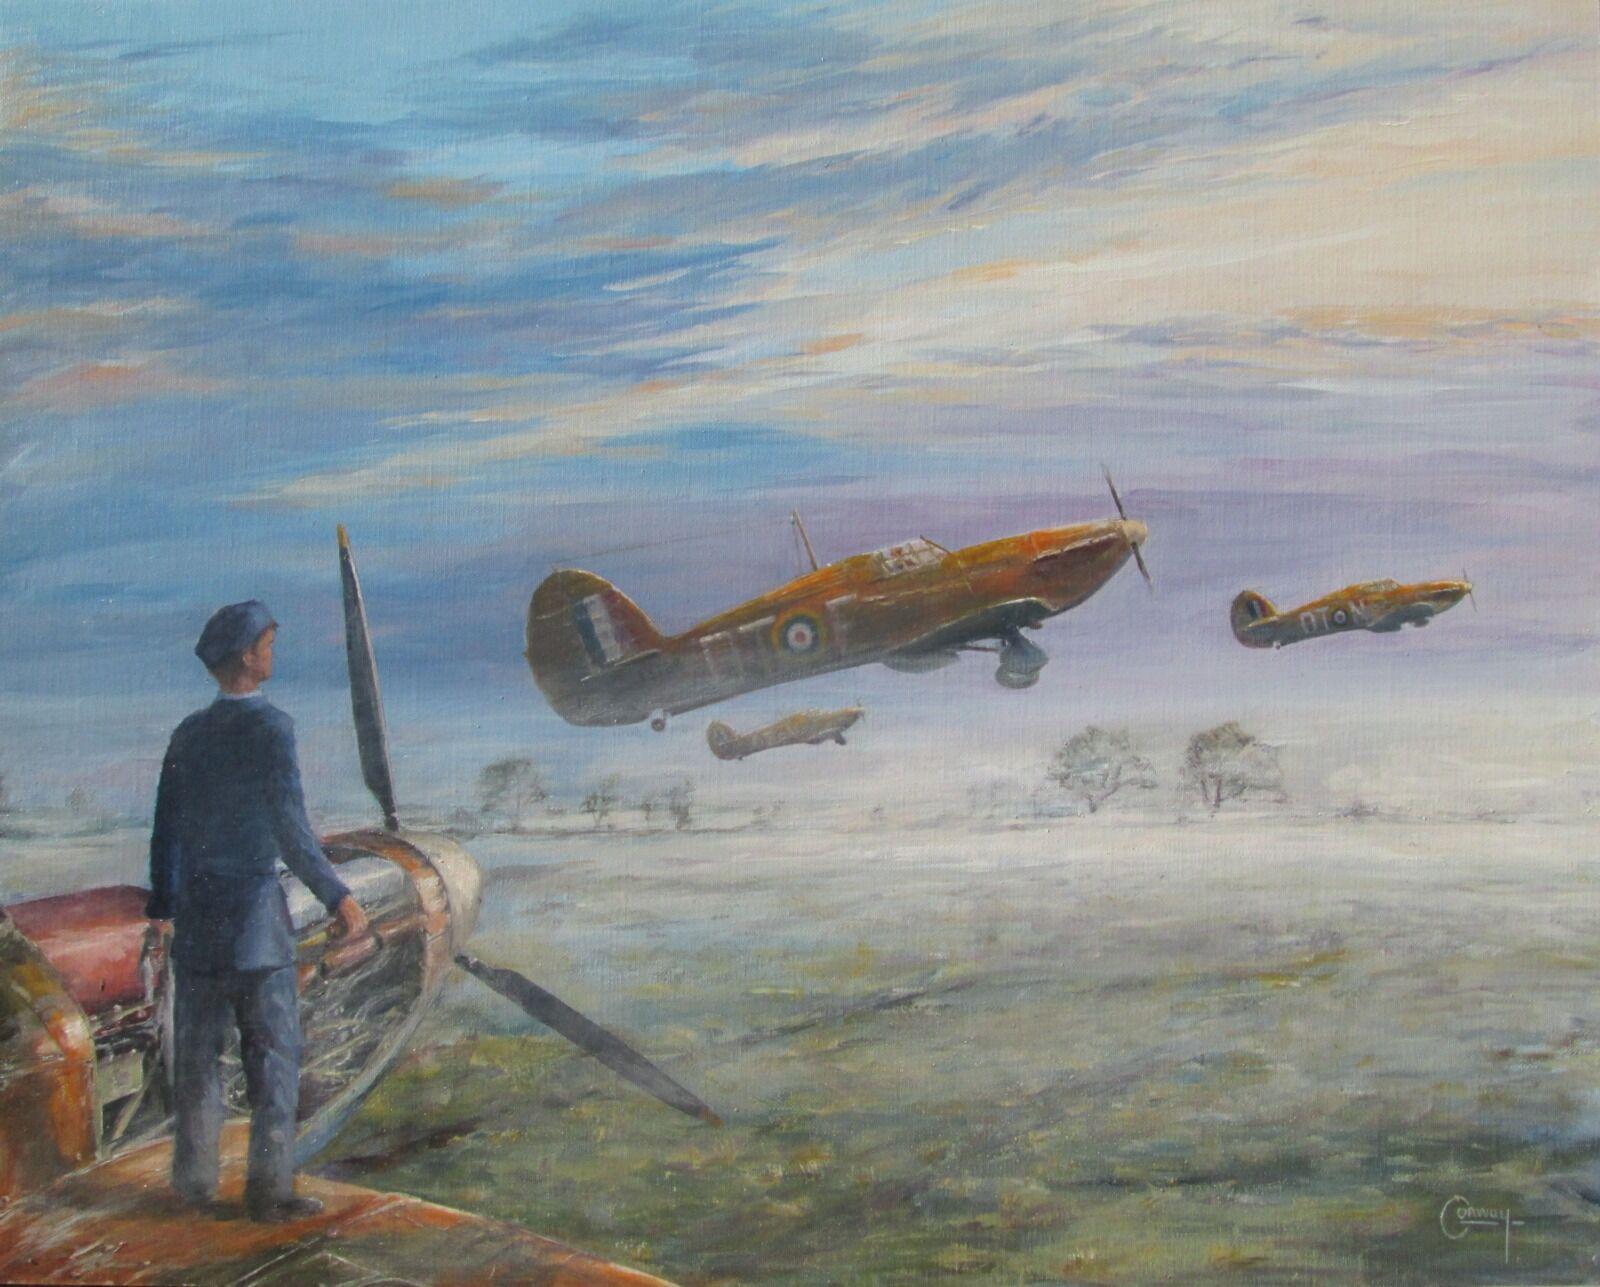 'Long Day Ahead' - Hurricanes of Sgt. Alexander George Girdwood, and F/Lt. Hugh Richard Aden Beresford of No. 257 Squadron